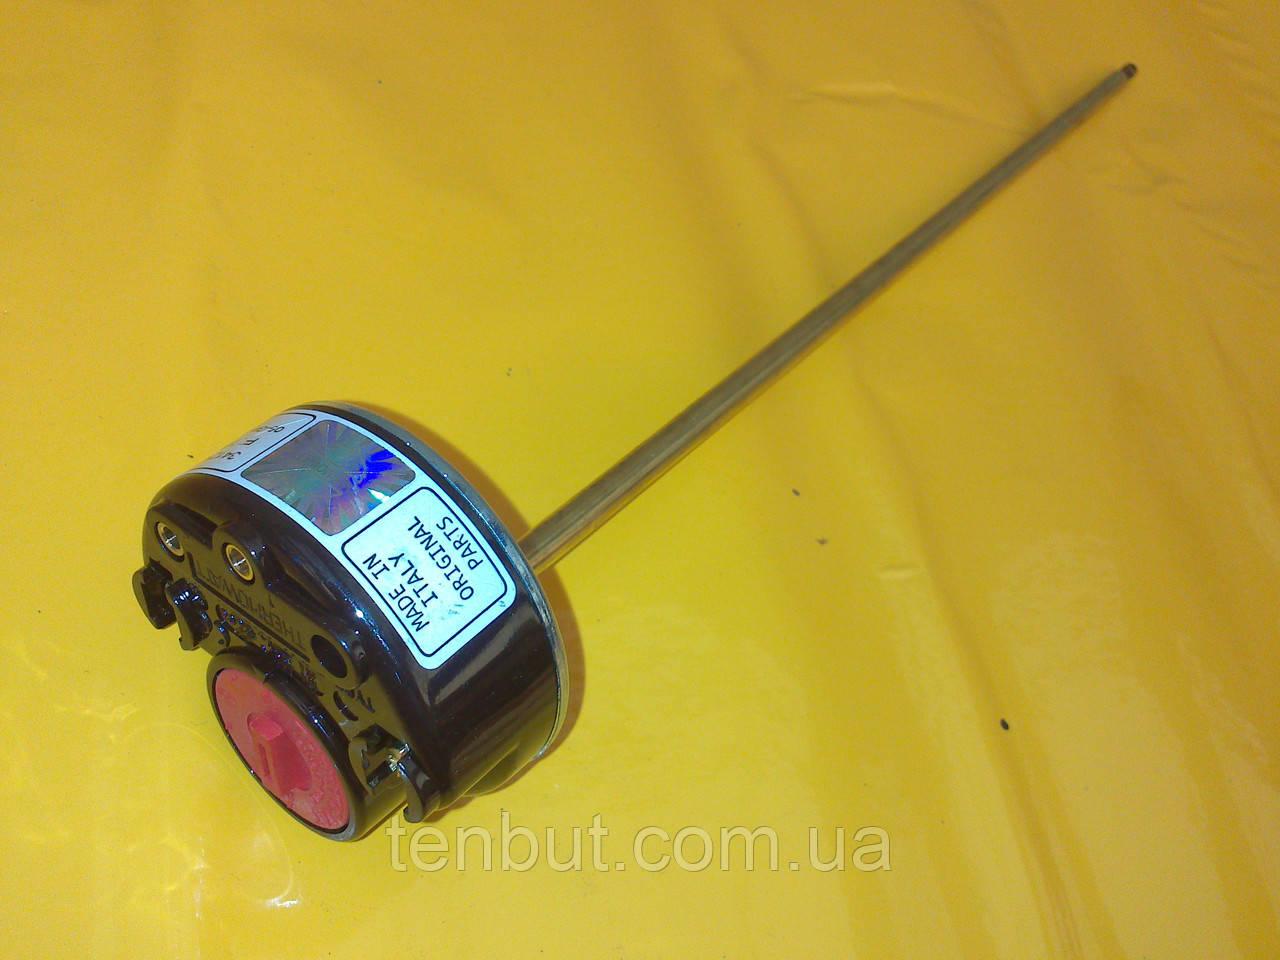 Терморегулятор ( термостат ) с голограммой 16 А/220В производство Италия THERMOWATT